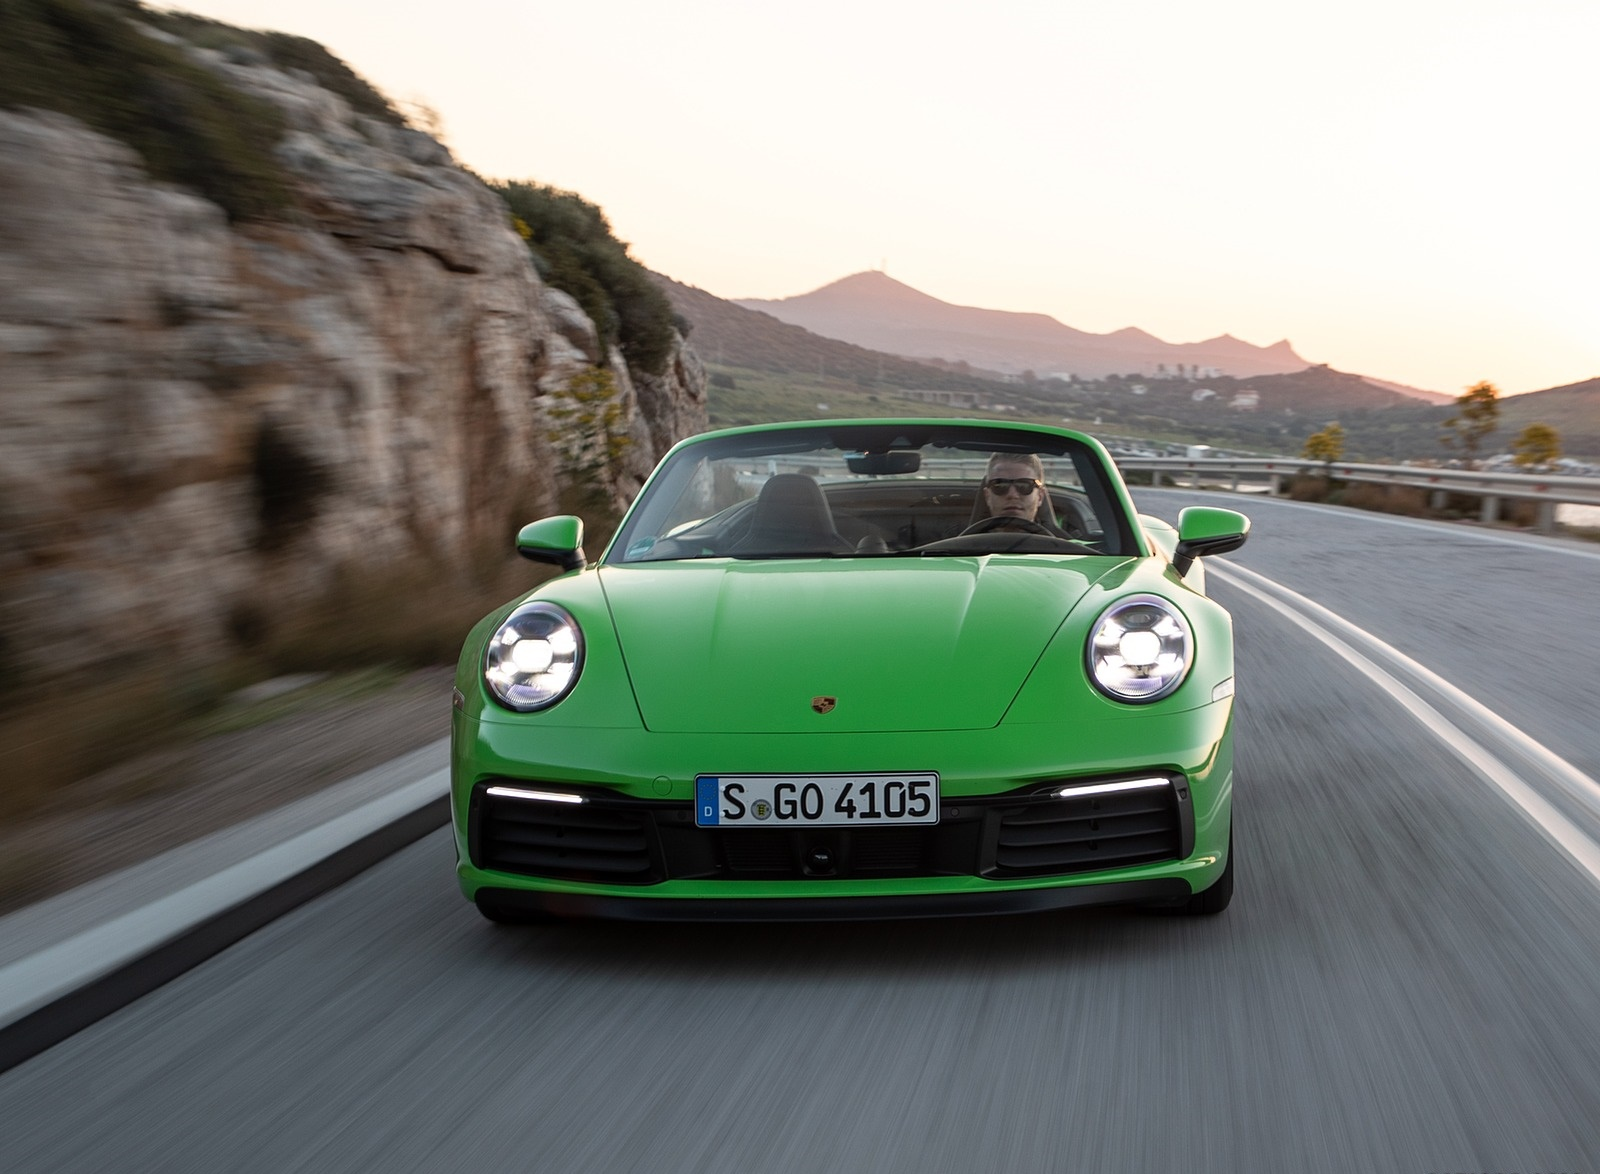 2020 Porsche 911 Carrera S Cabriolet (Color: Lizard Green) Front Wallpapers (10)